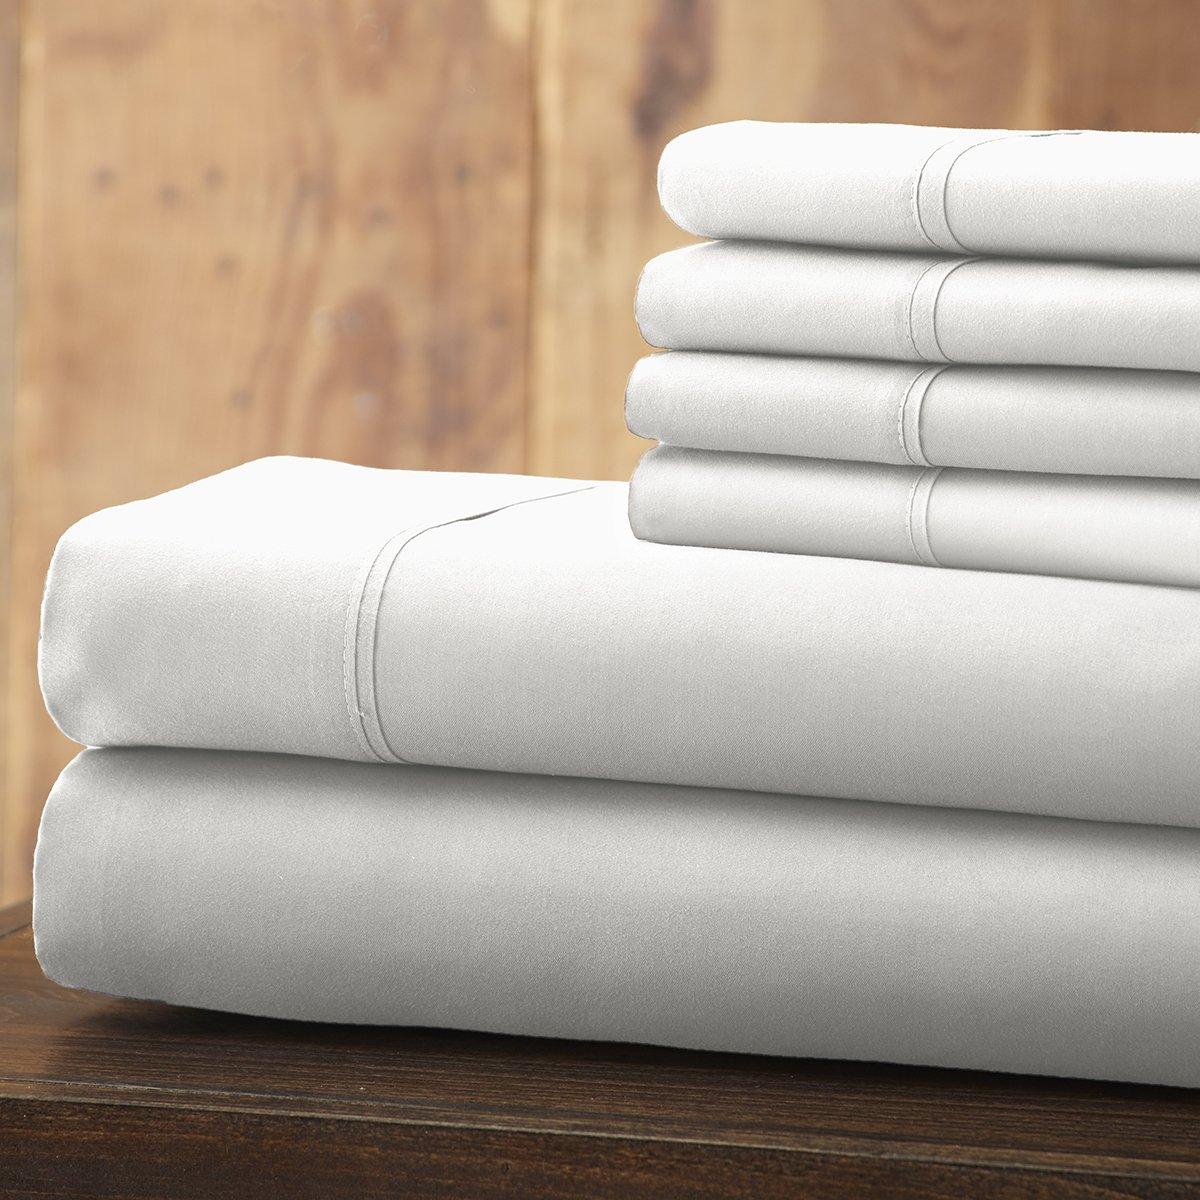 Spirit Linen 6 Piece Everyday Essentials 1800 Series Sheet Set, King, White by Spirit Linen, Inc Hotel 5th Ave